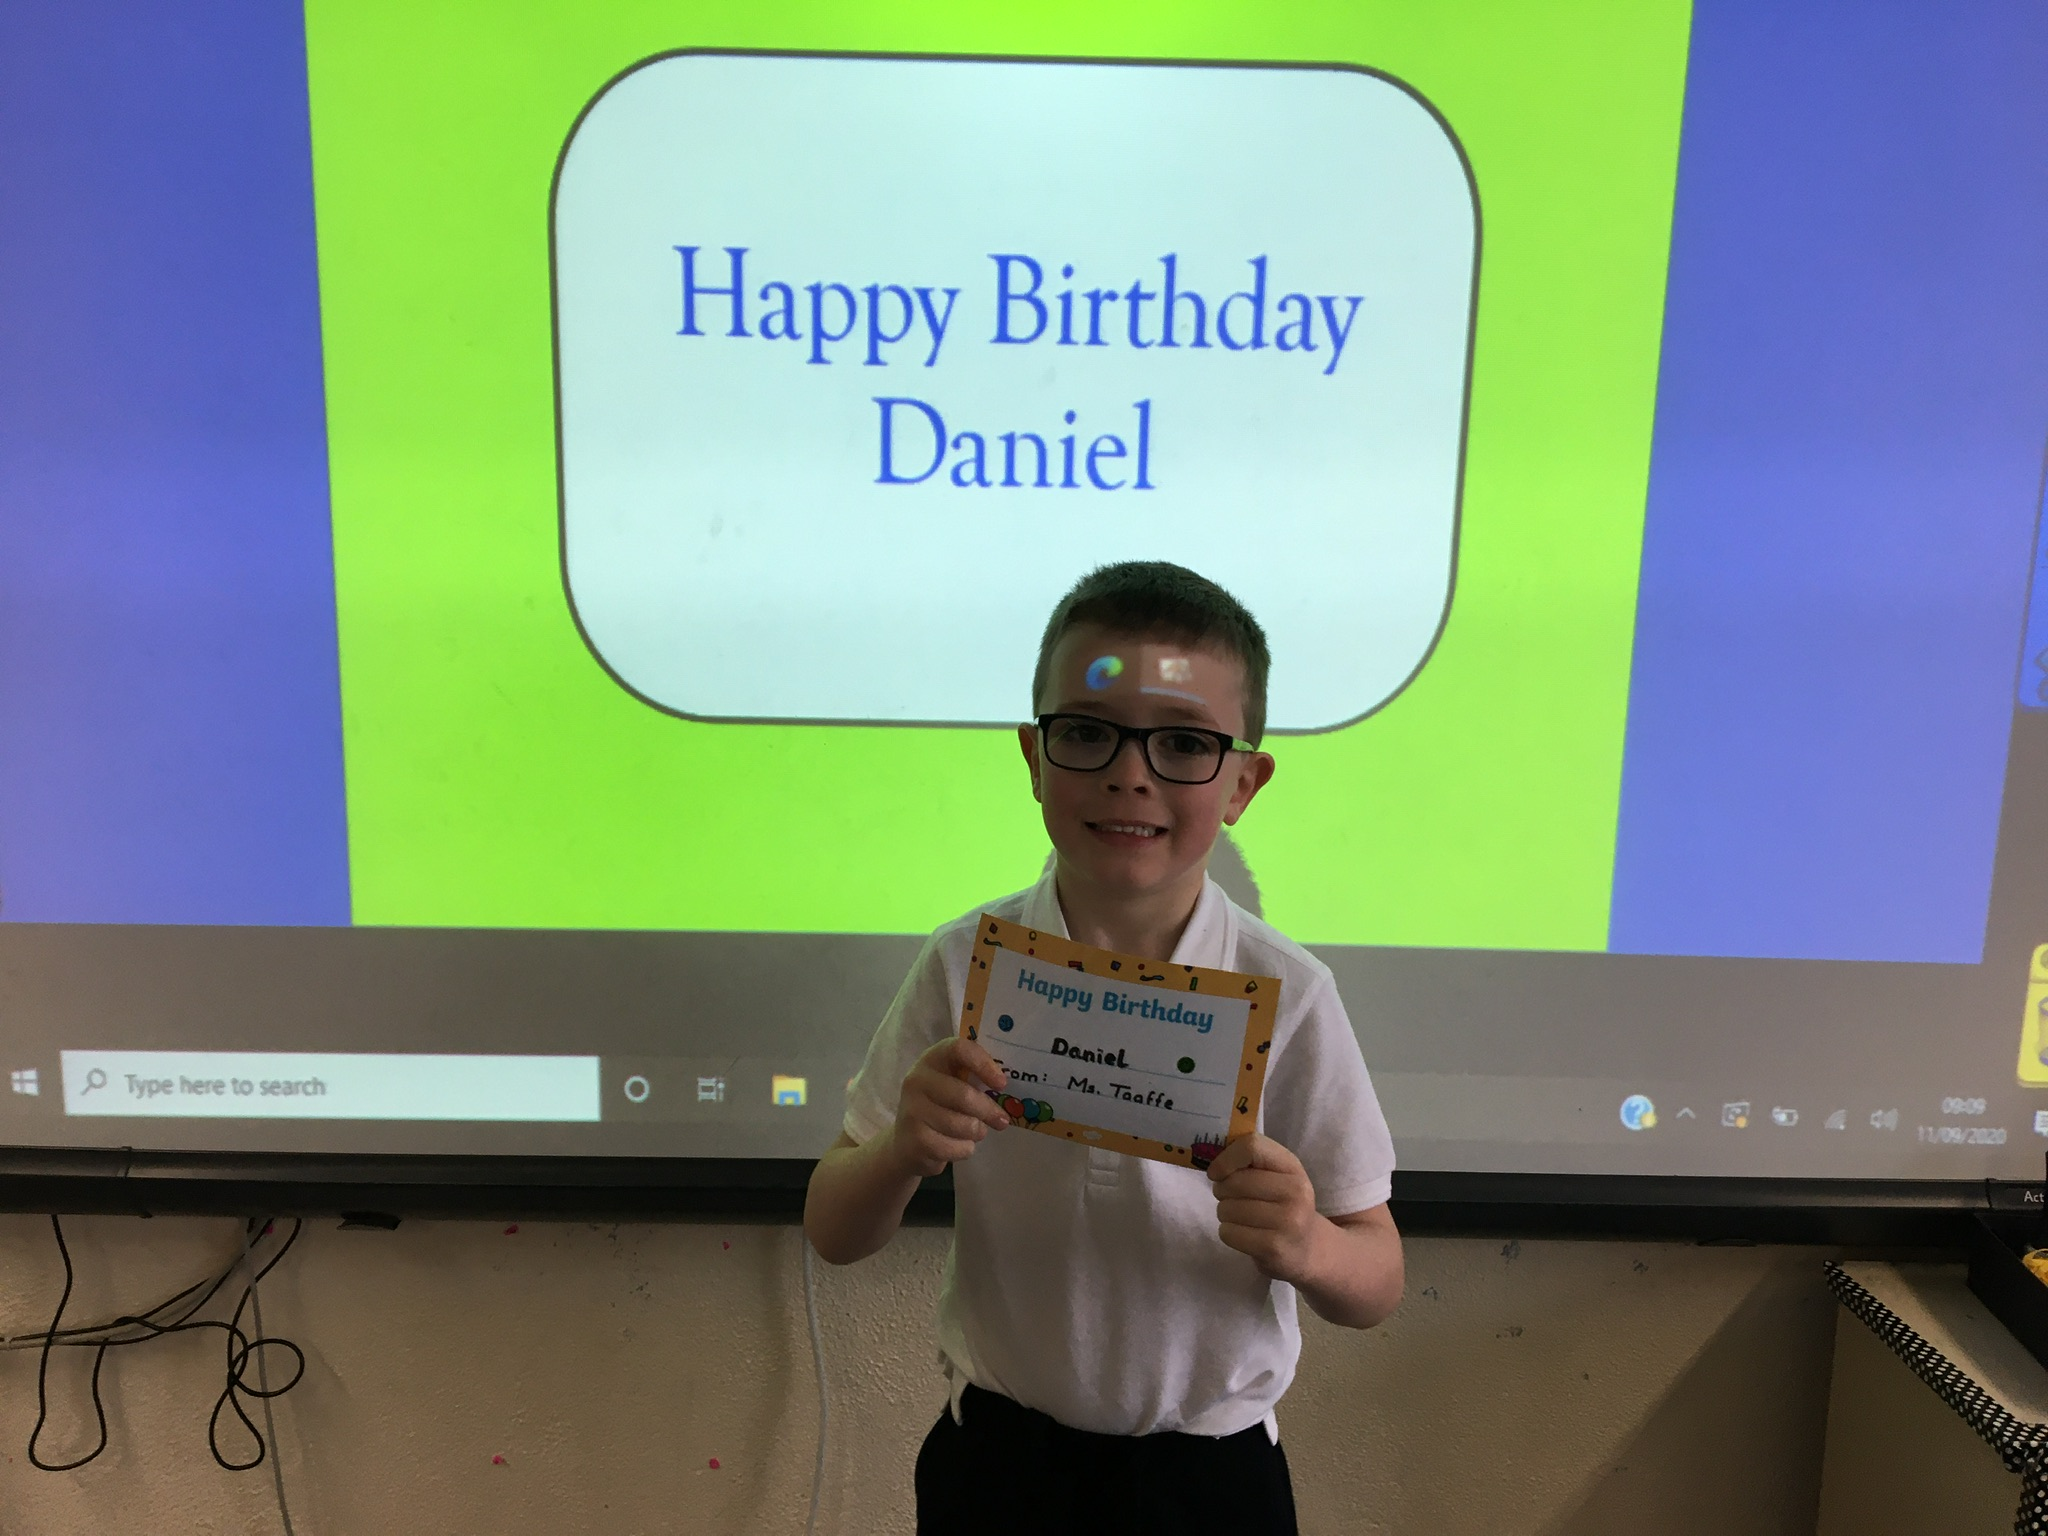 Happy Birthday Daniel.